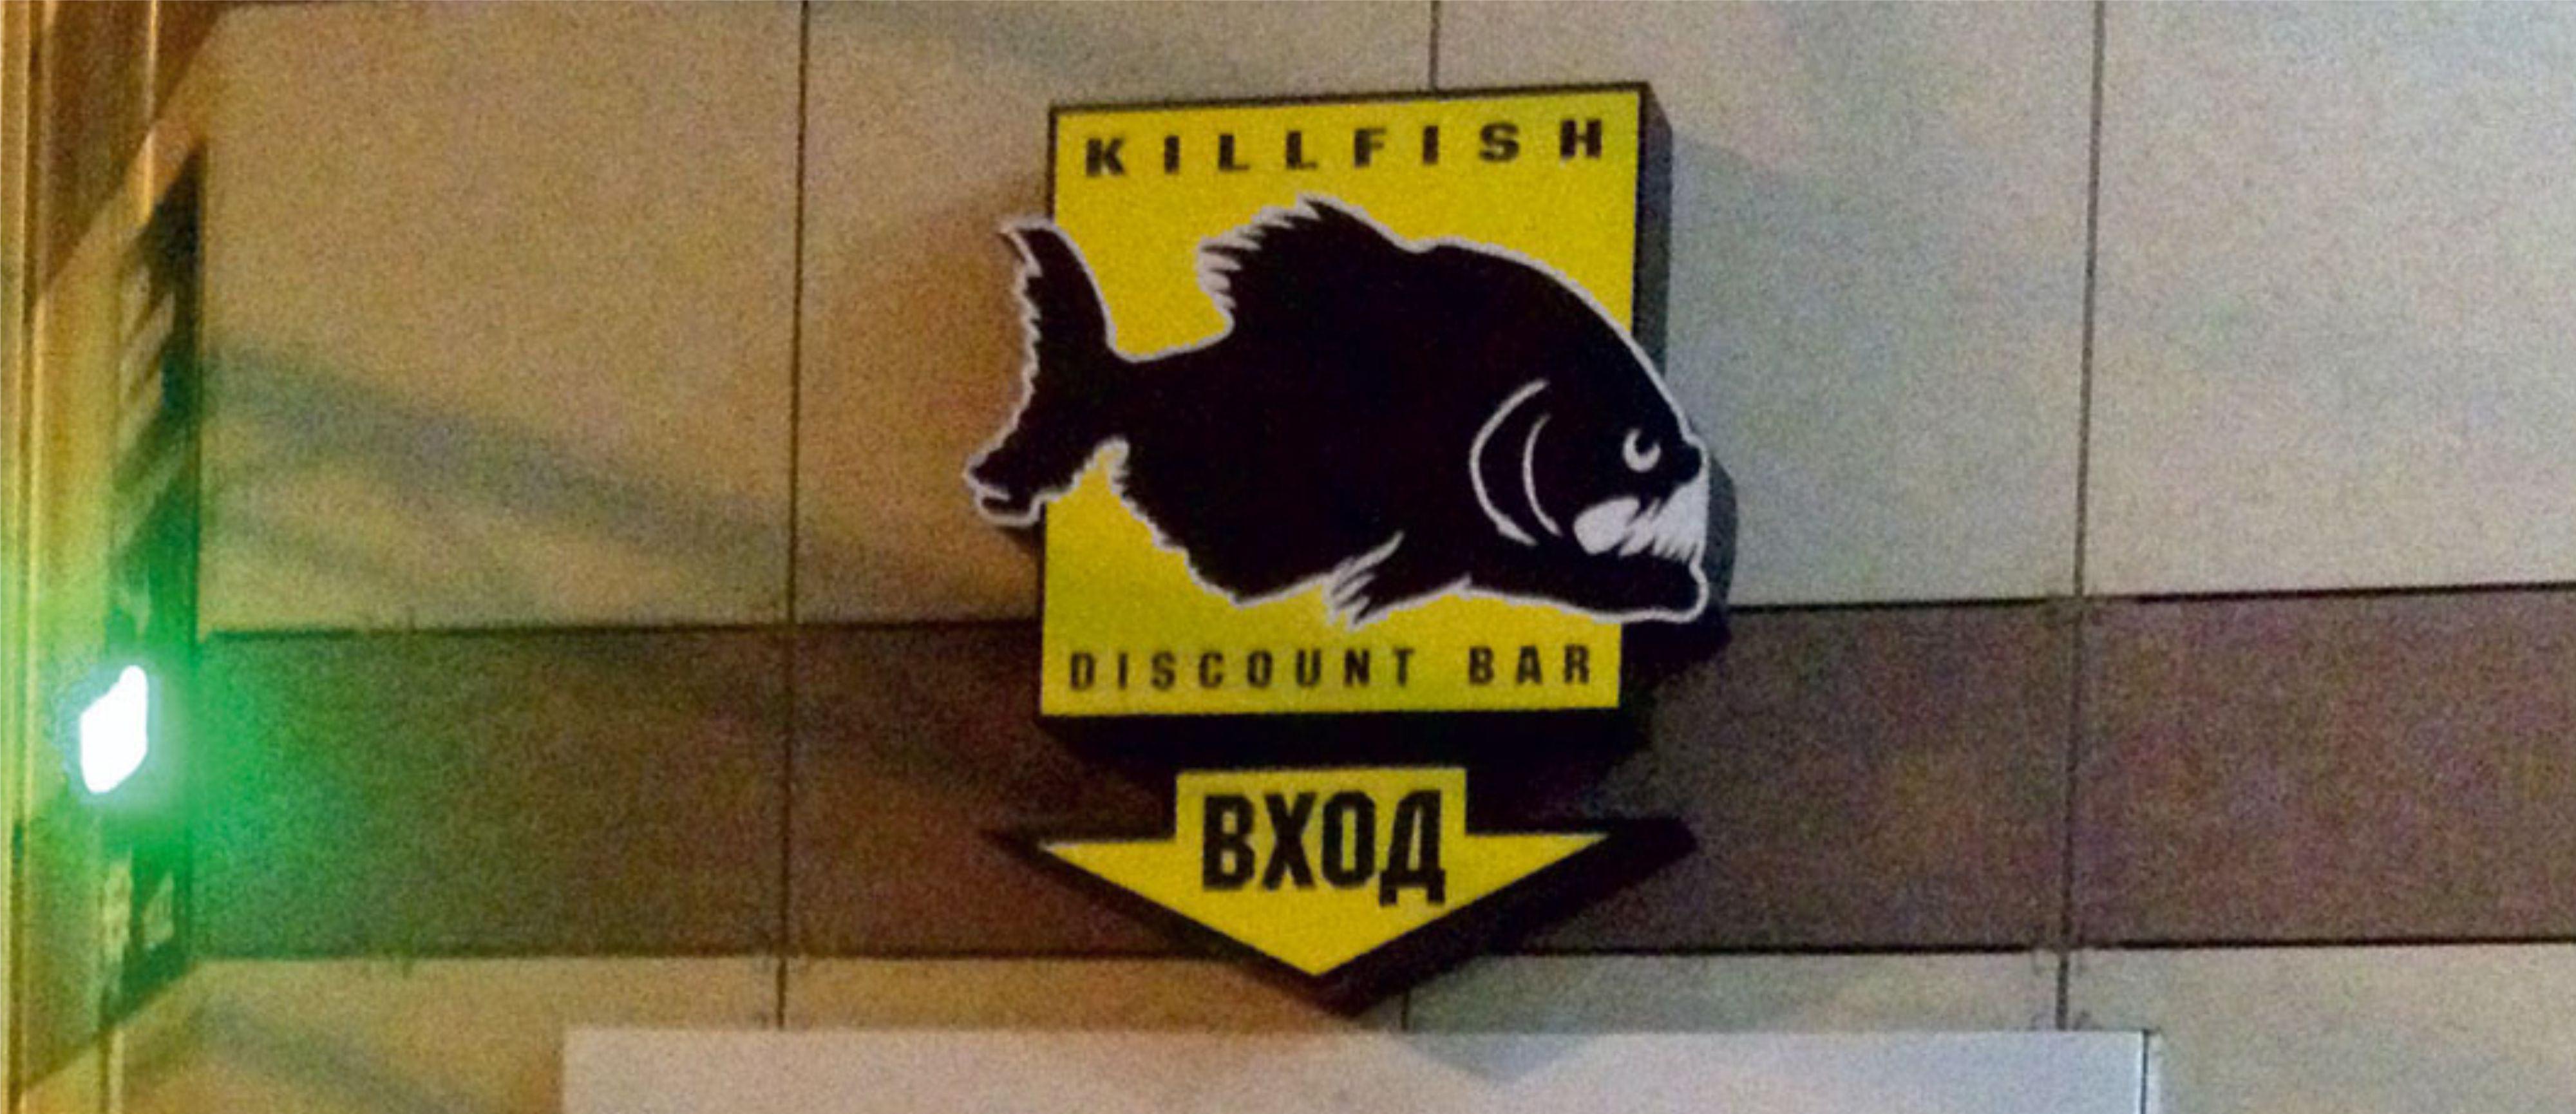 Kill-Fish